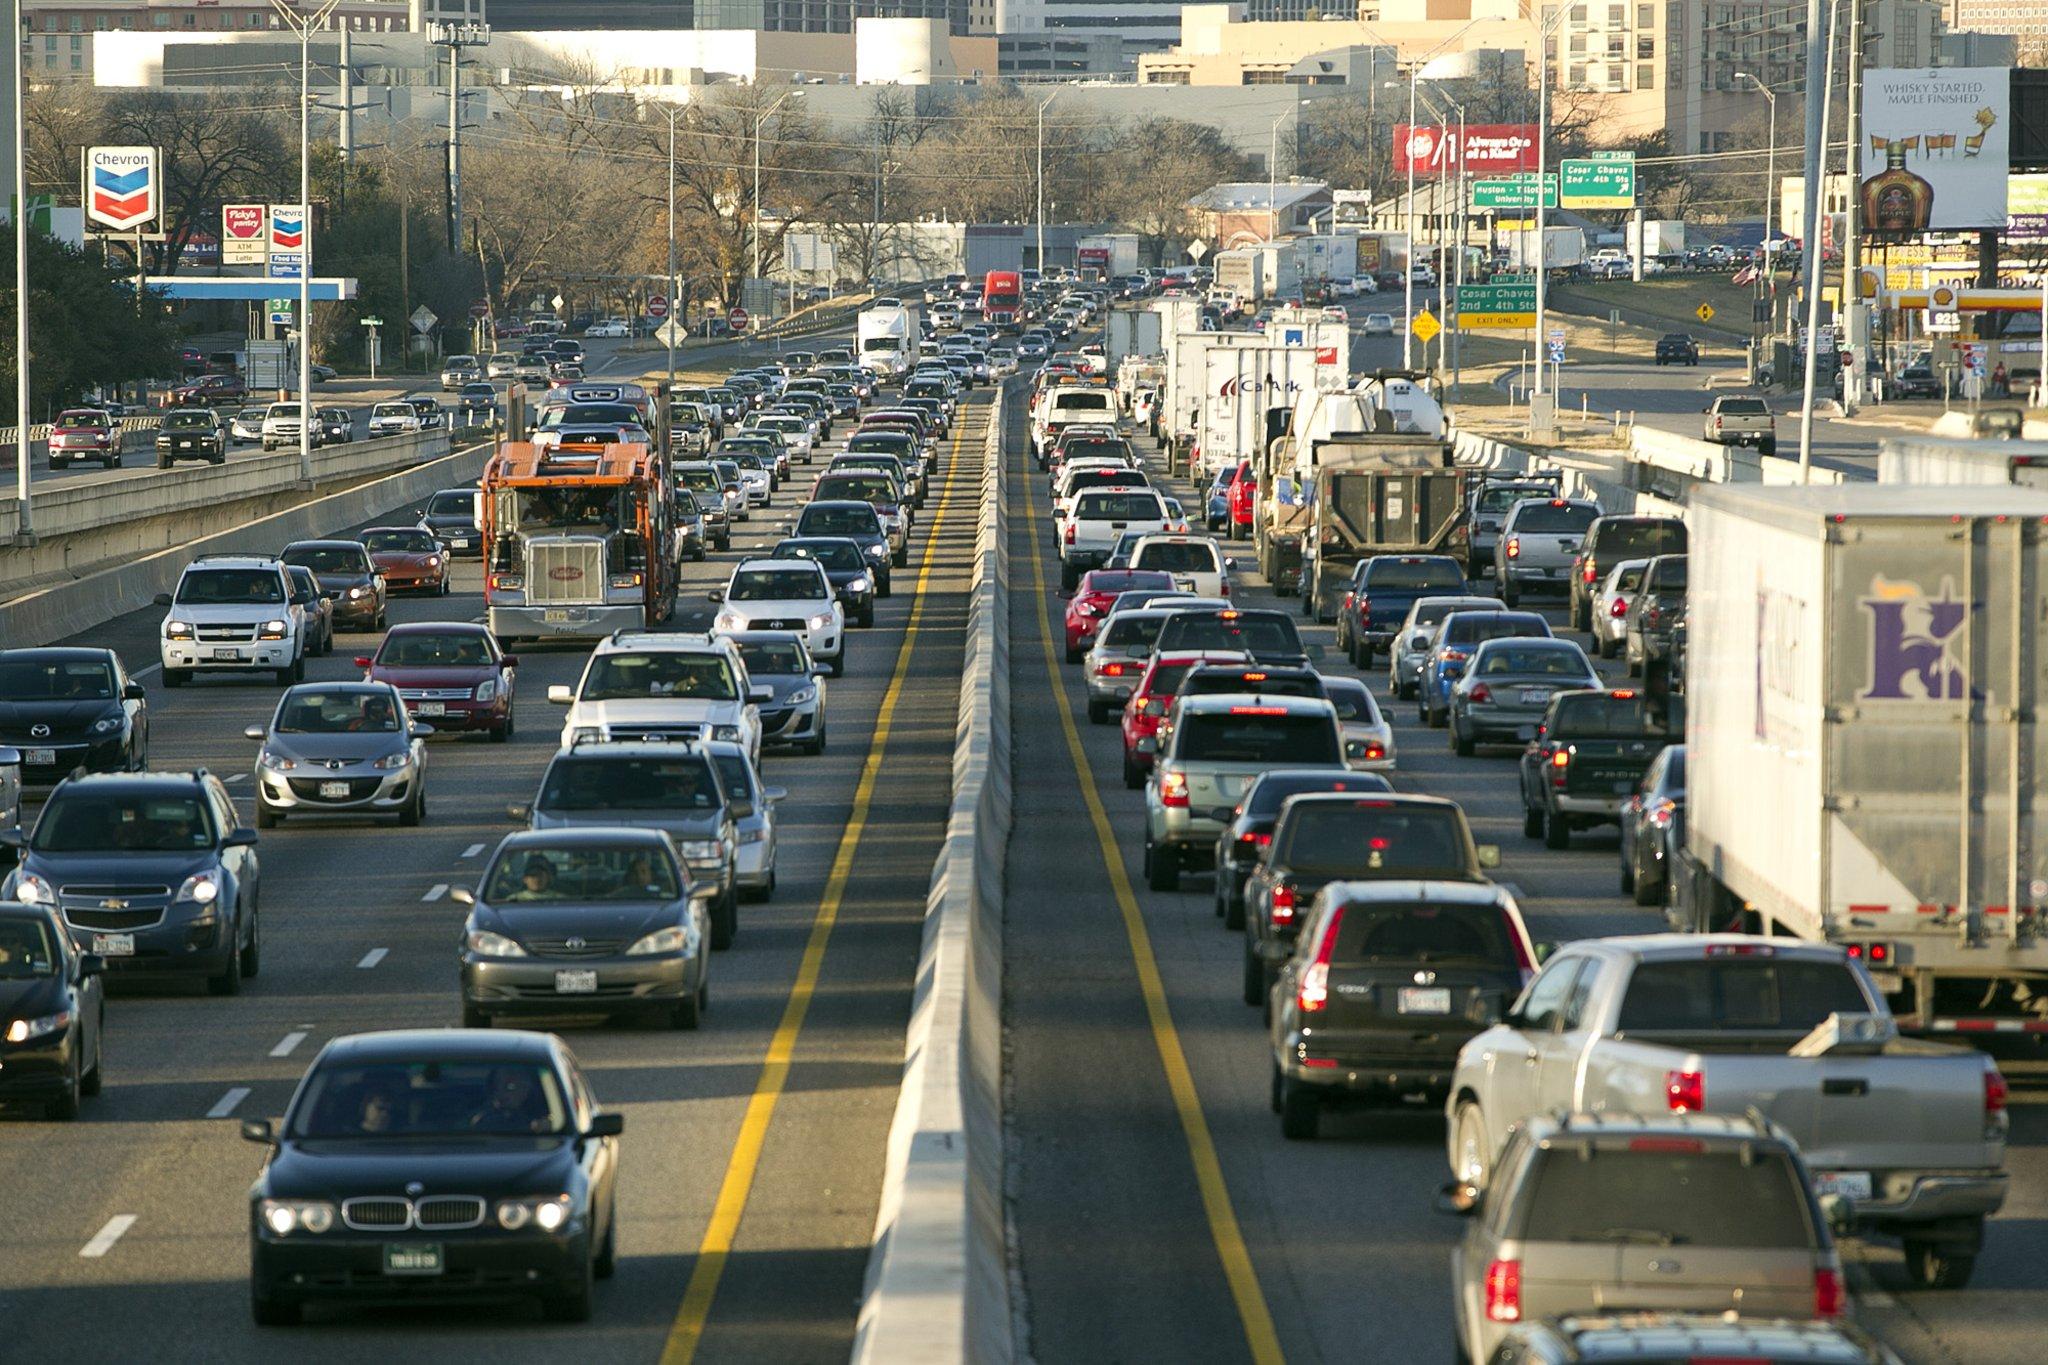 I35 traffic headed into Downtown Austin